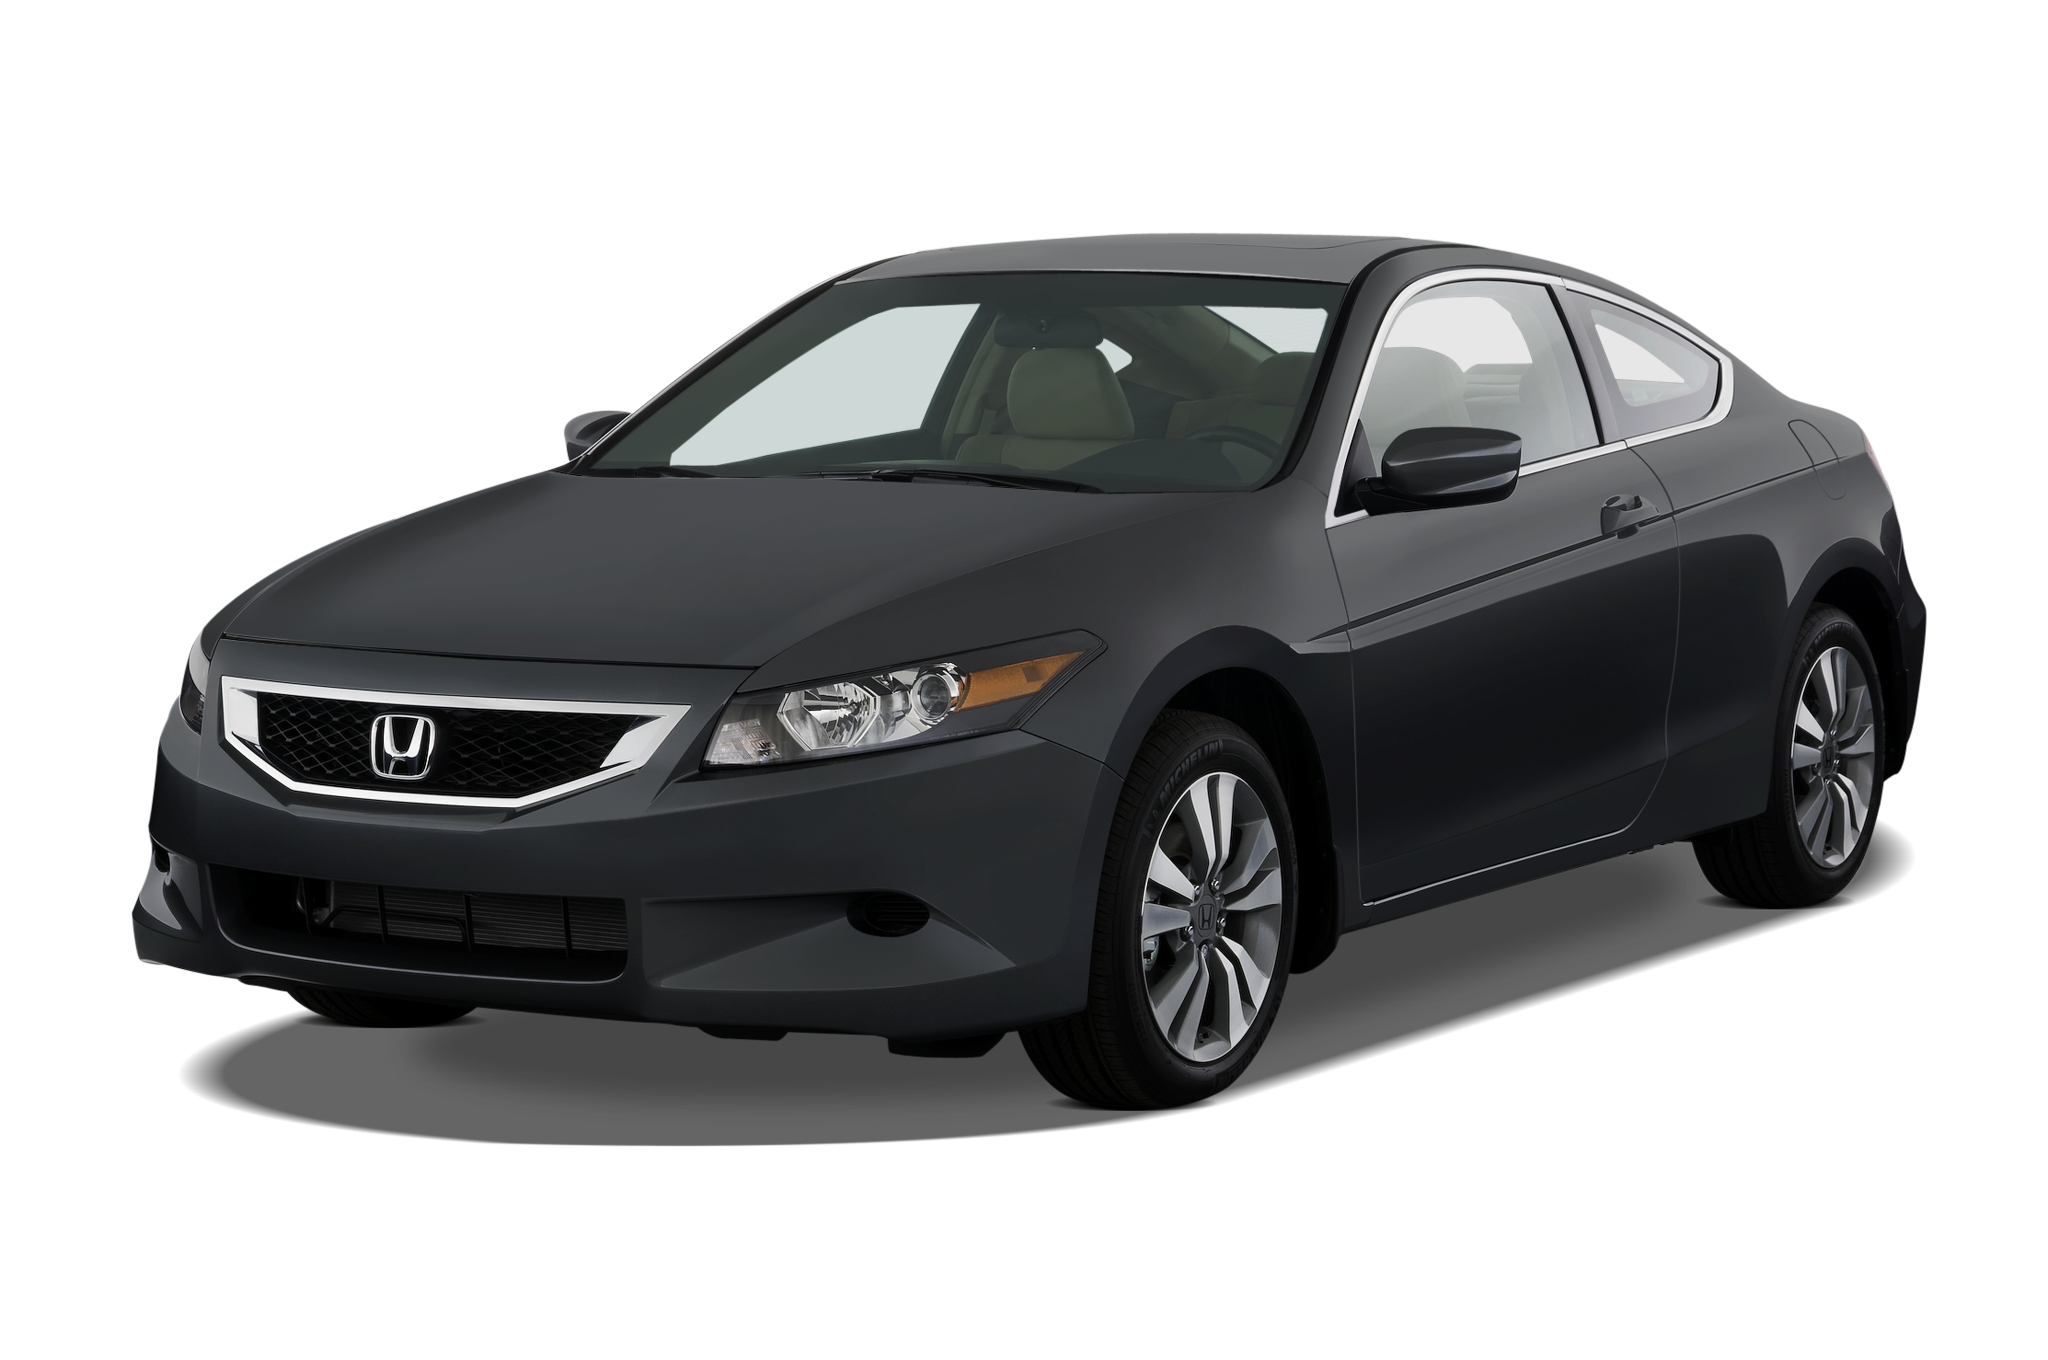 Honda Accord Exl 2015 >> 2010 Honda Accord Coupe EX-L - Honda Midsize Coupe Review - Automobile Magazine